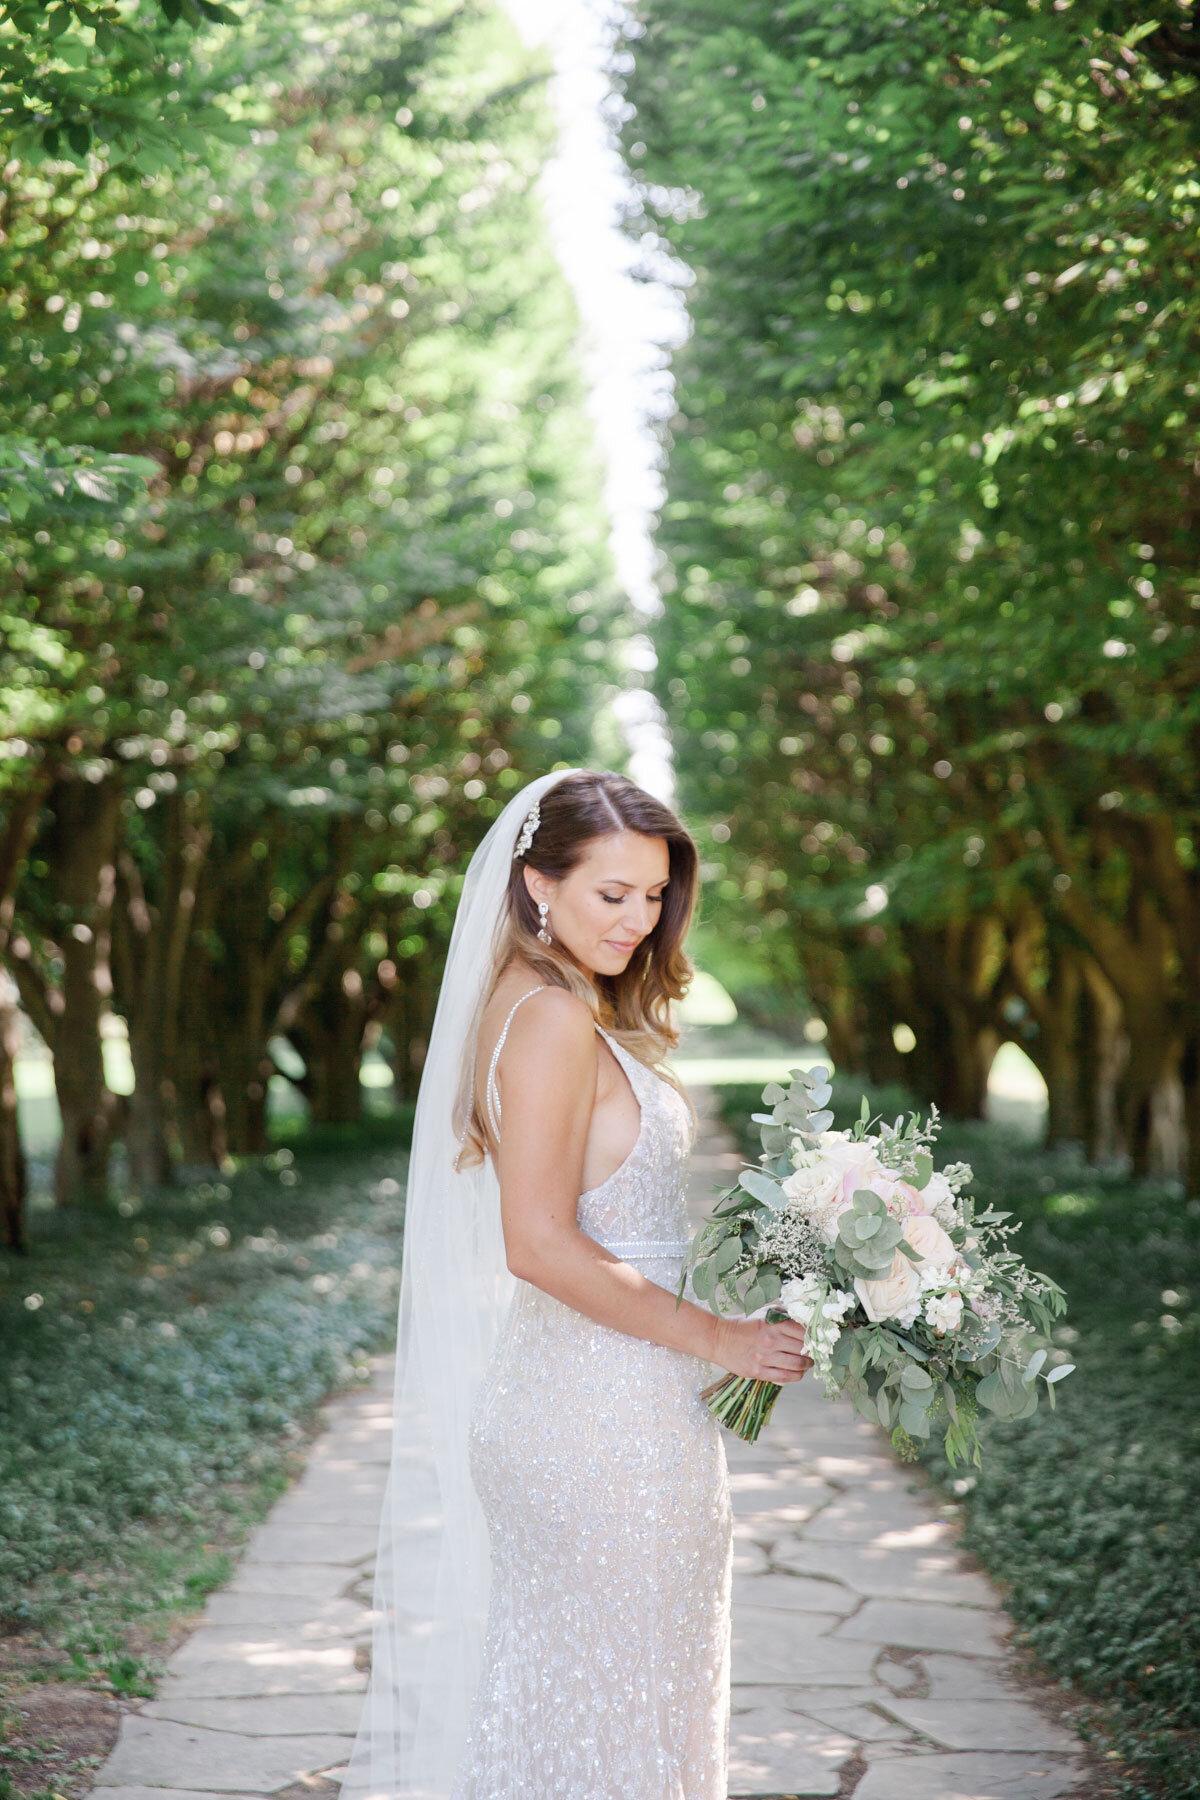 Chateau-des-Charmes-Wedding-Summer-Vineyard-Bride-Niagara-on-the-Lake-photos-by-Gemini-Photography-Ontario-0025.jpg